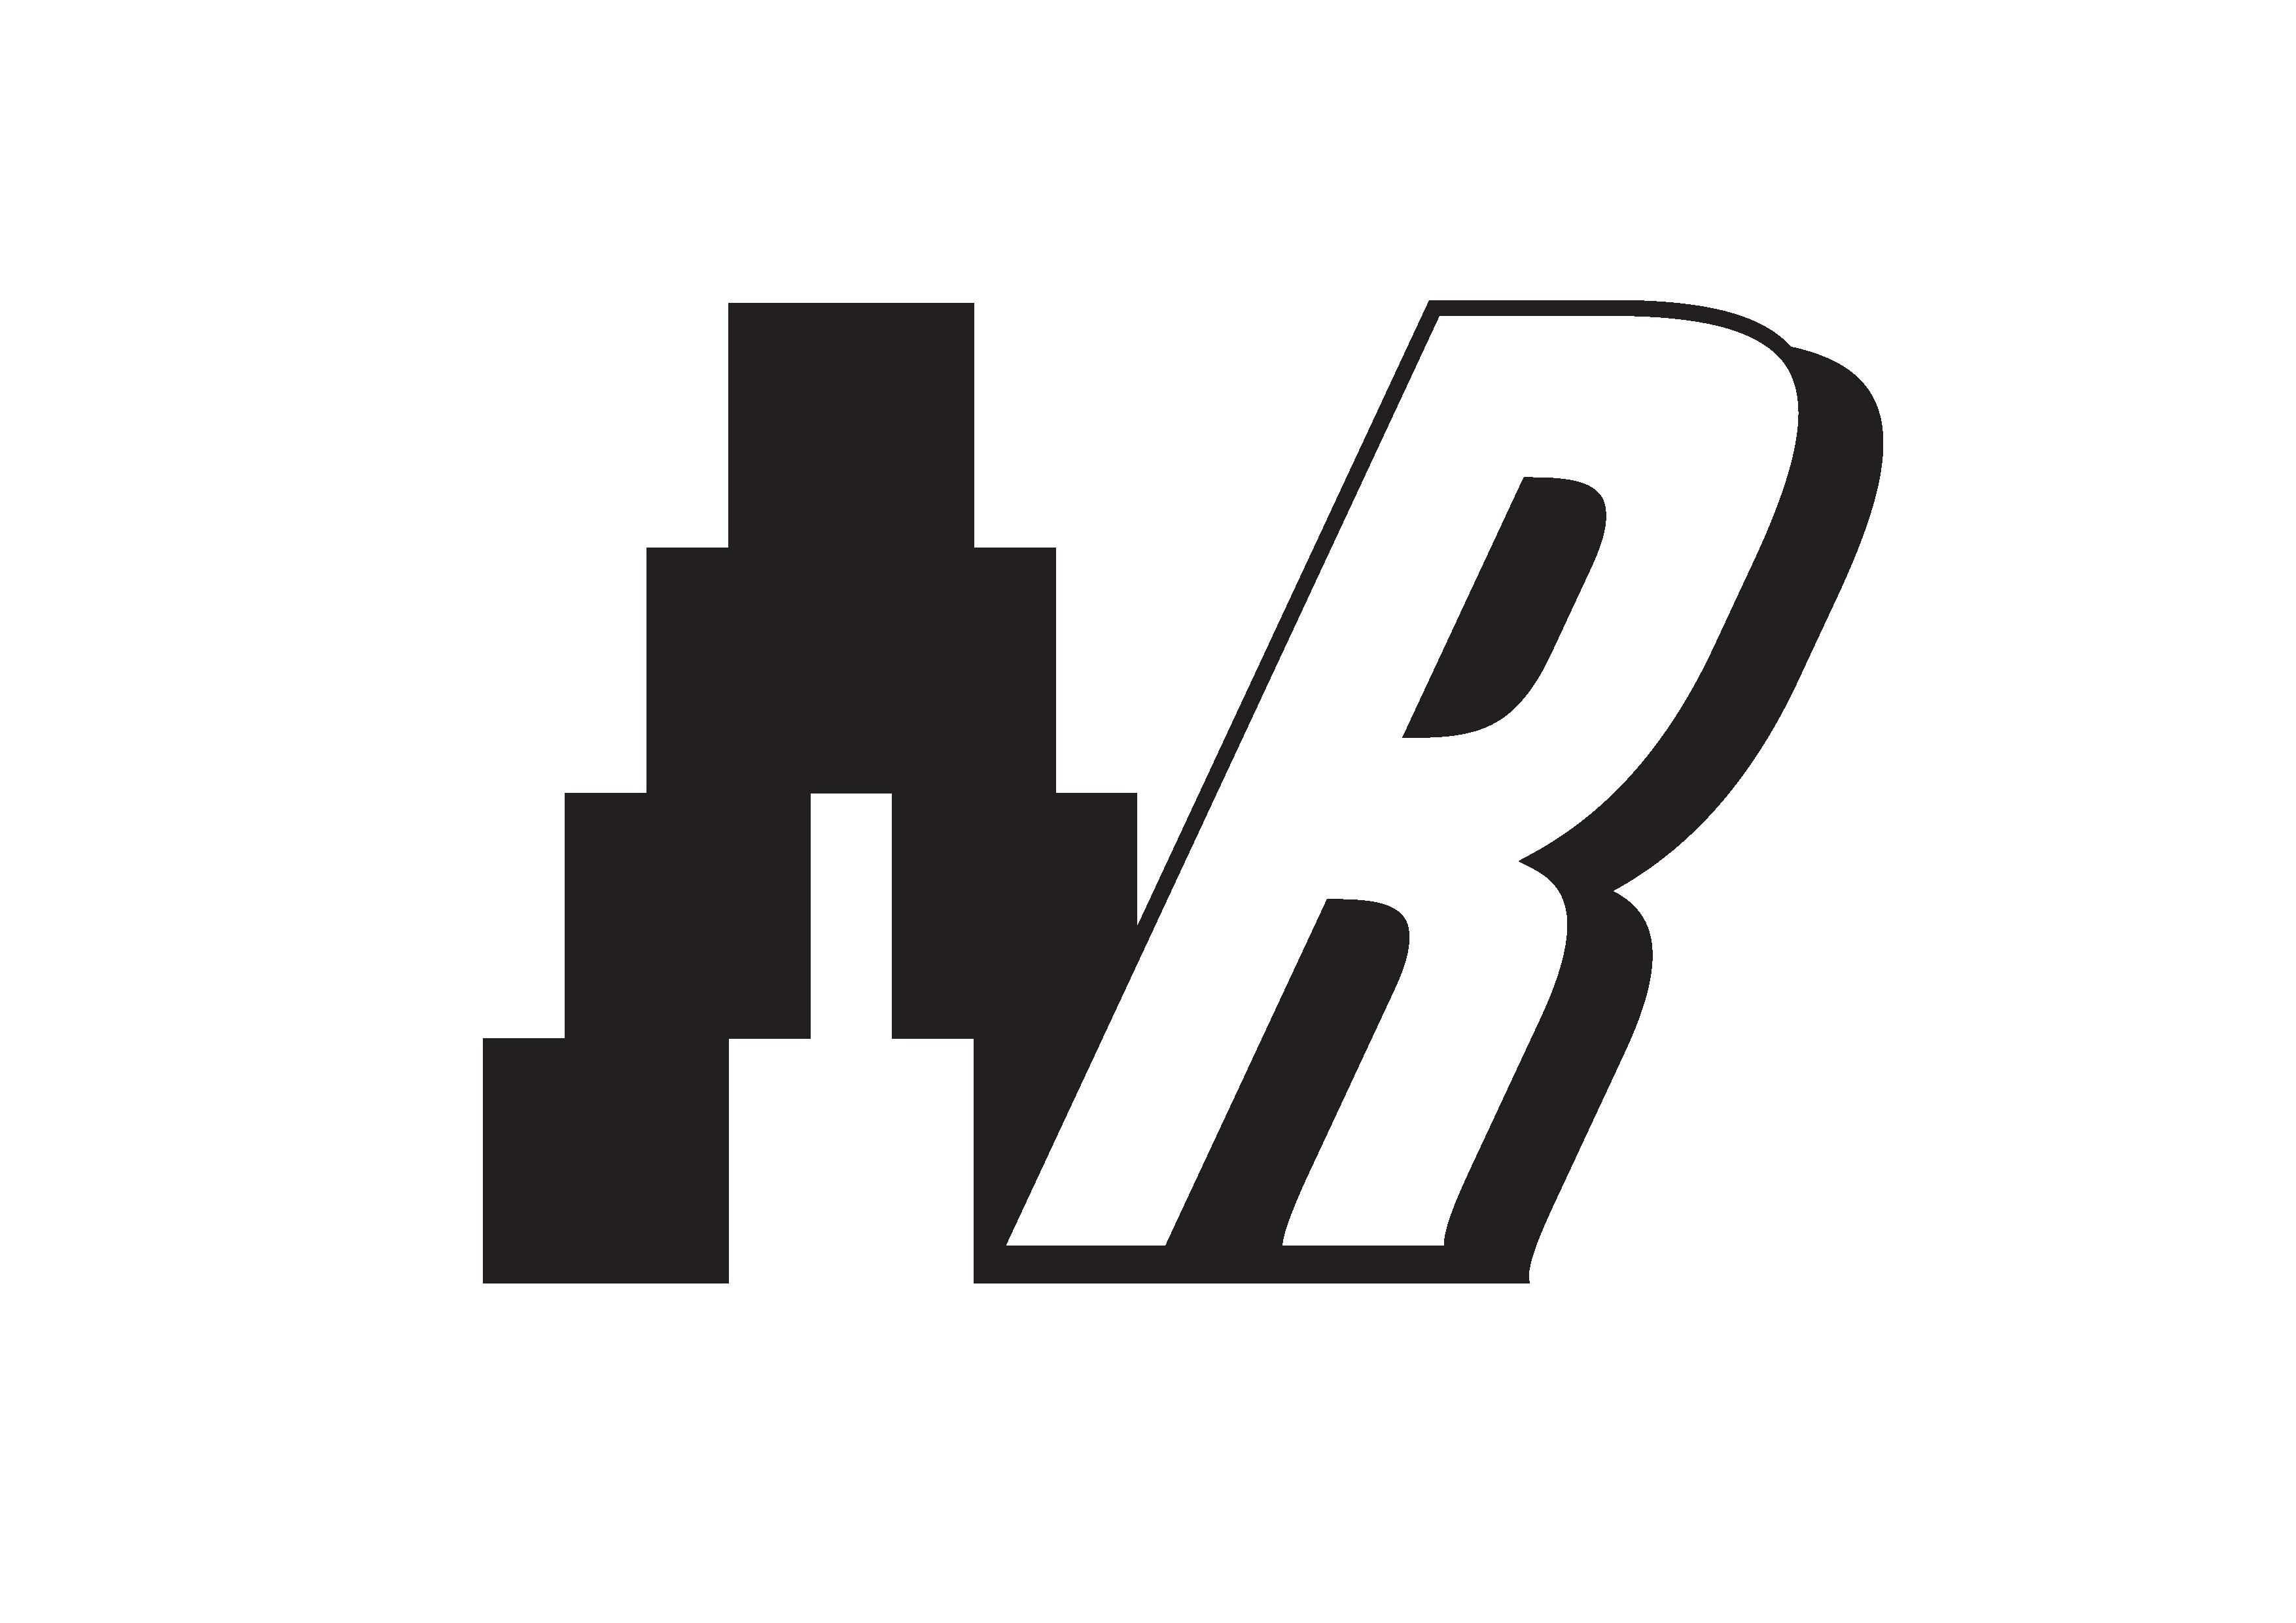 And Rising's logo